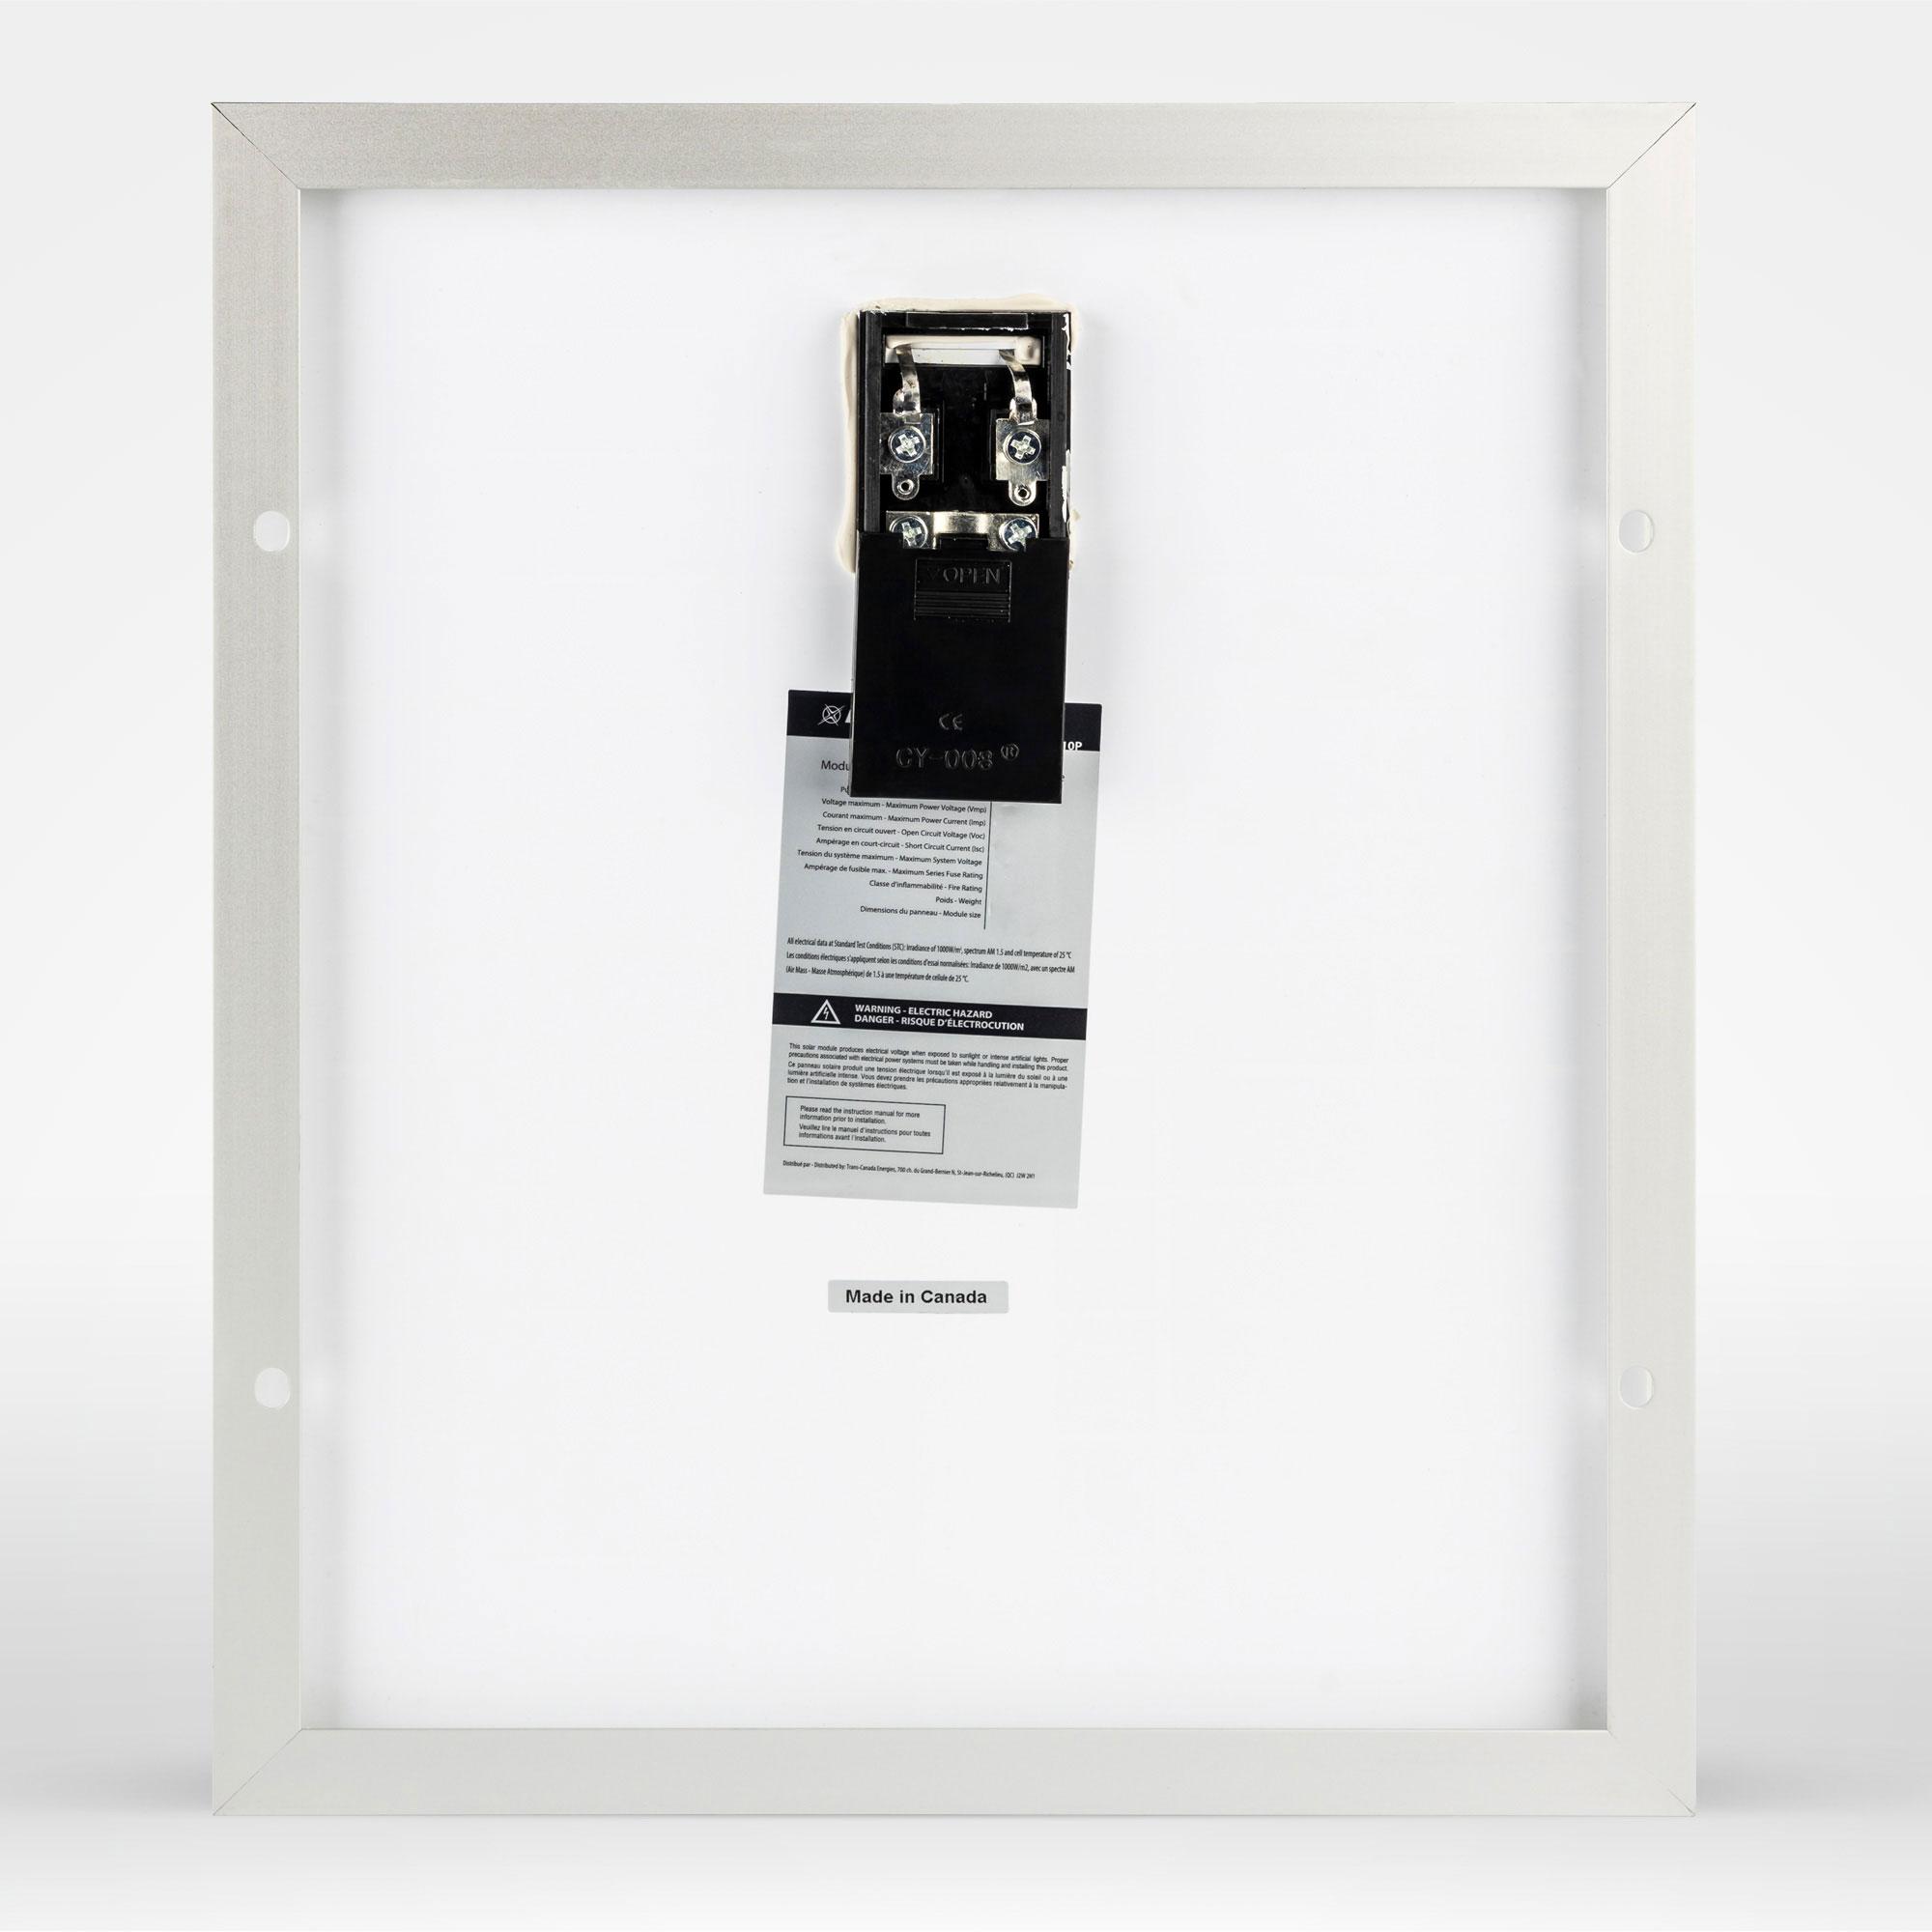 EWS-4.4P-C   Solar panel polycristalline 12V 4.5W